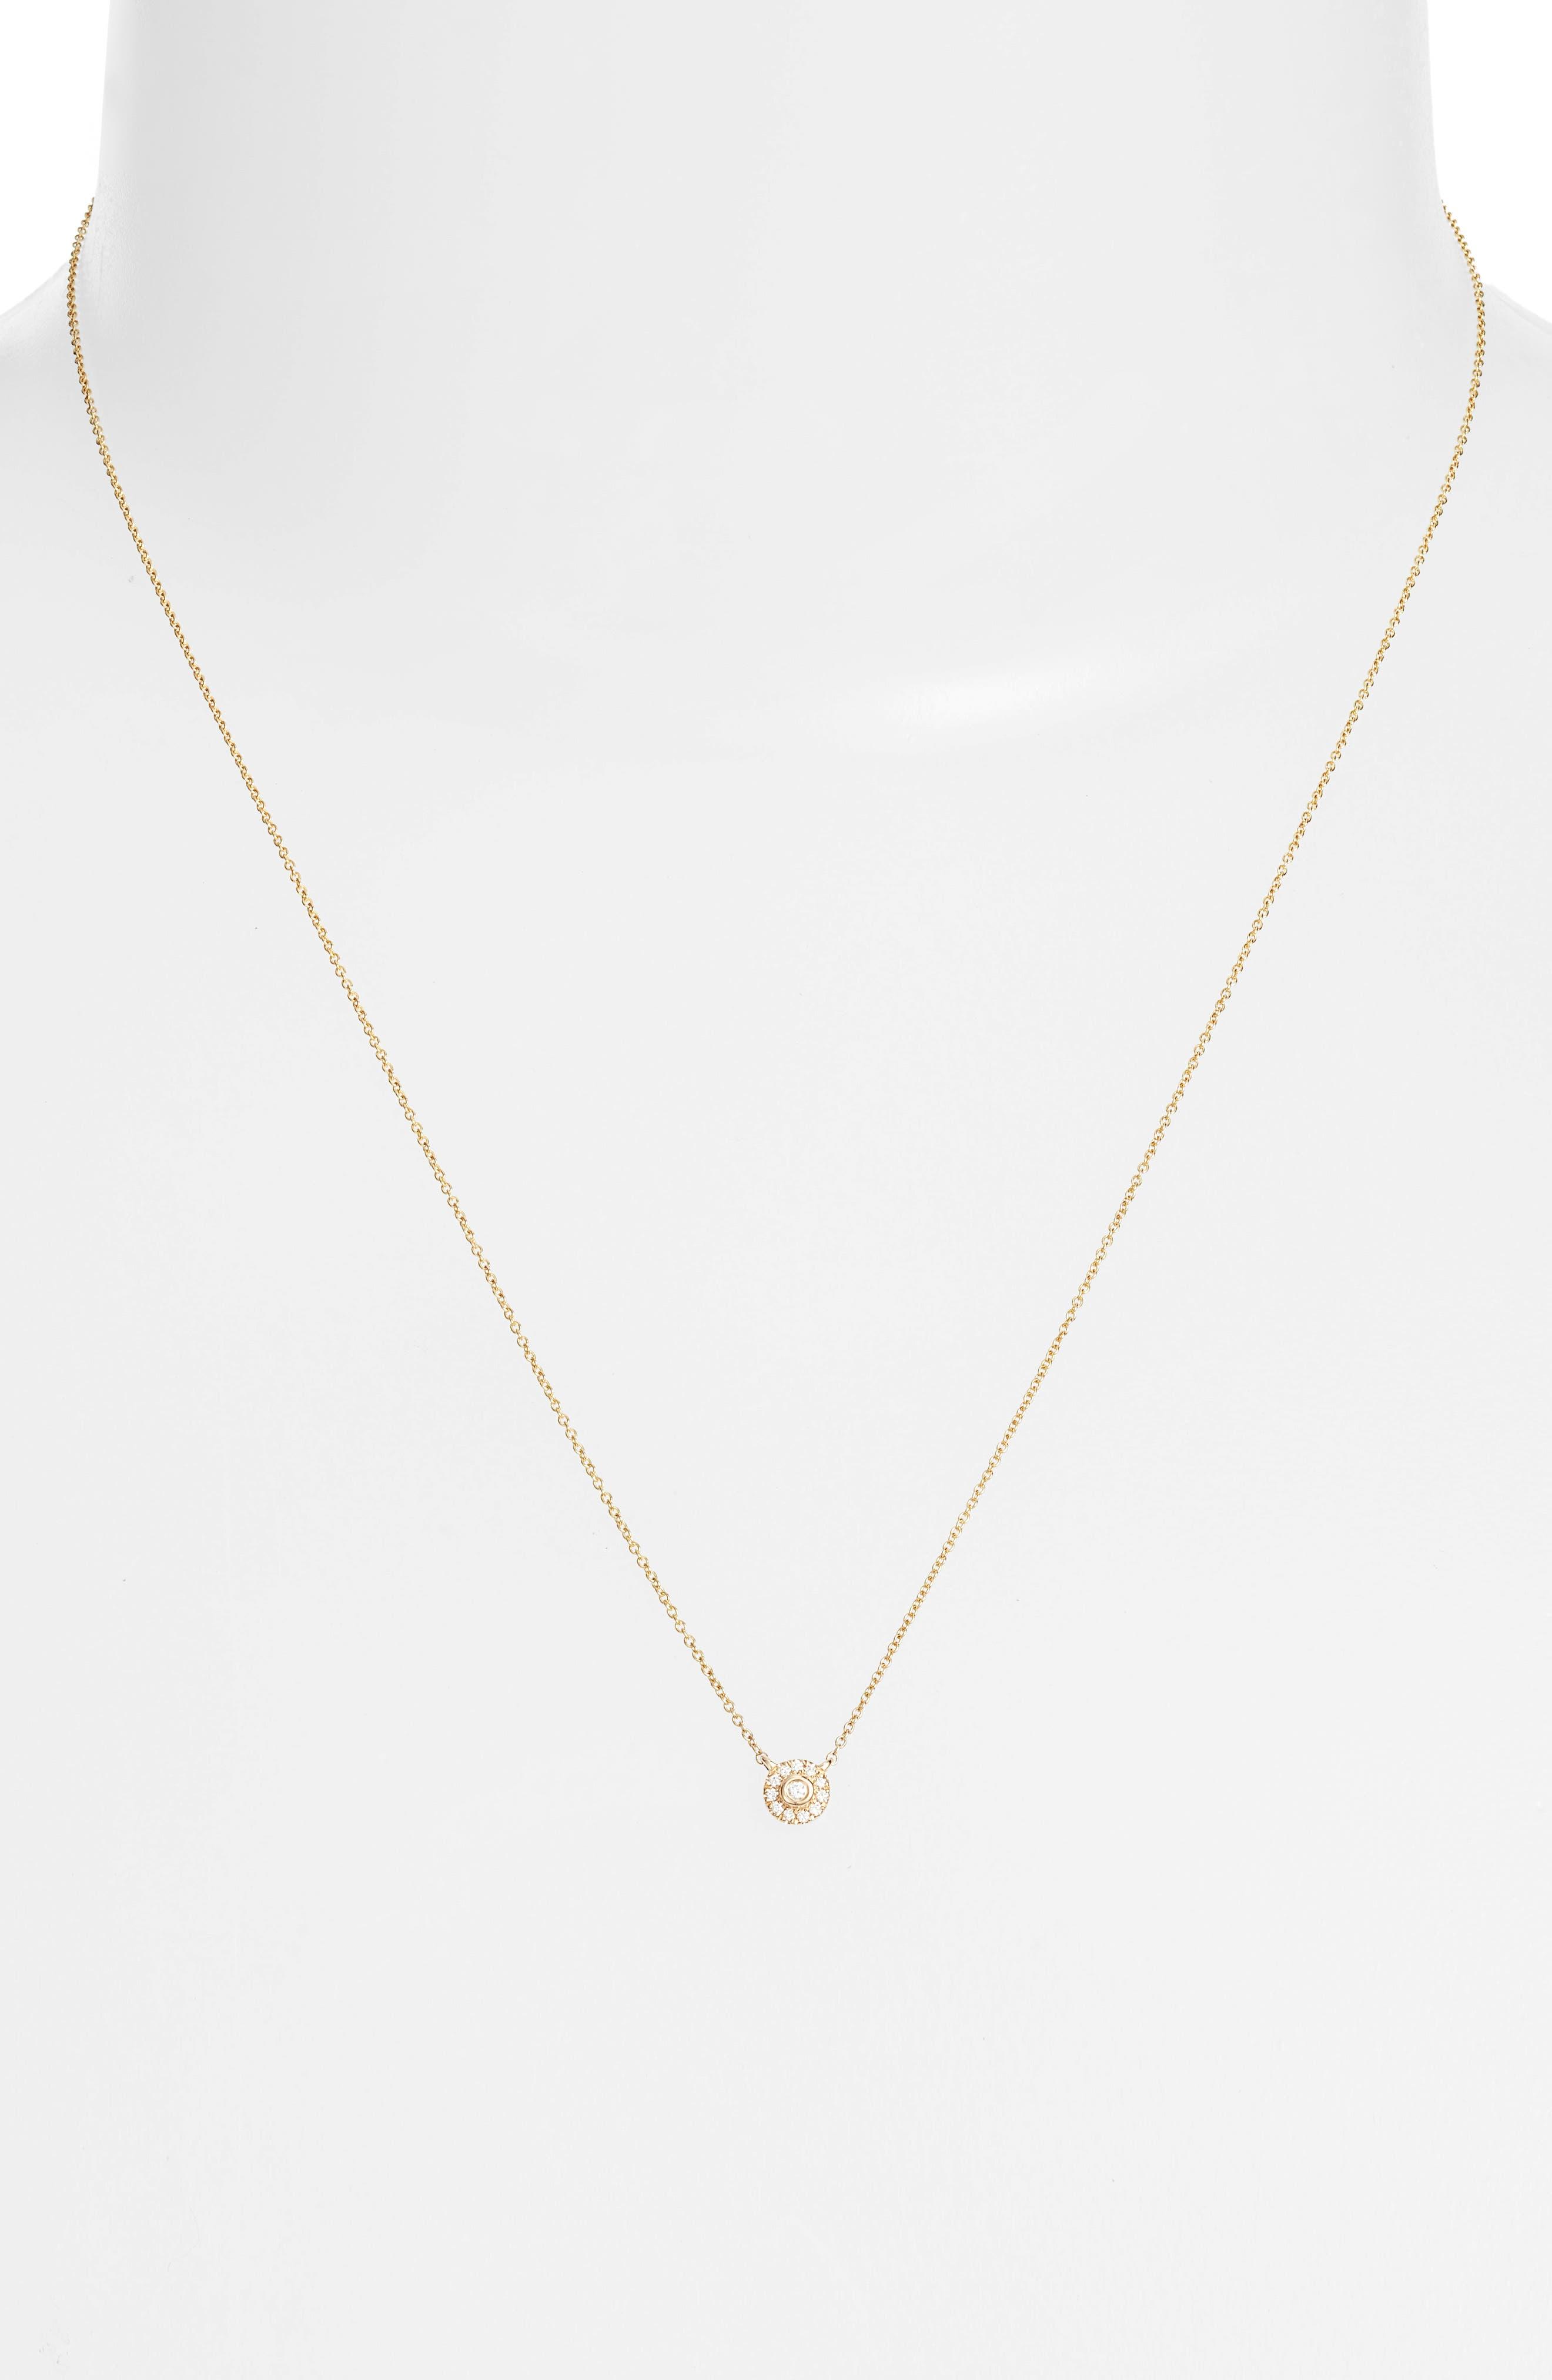 Lauren Joy Mini Diamond Disc Necklace,                             Alternate thumbnail 2, color,                             Yellow Gold